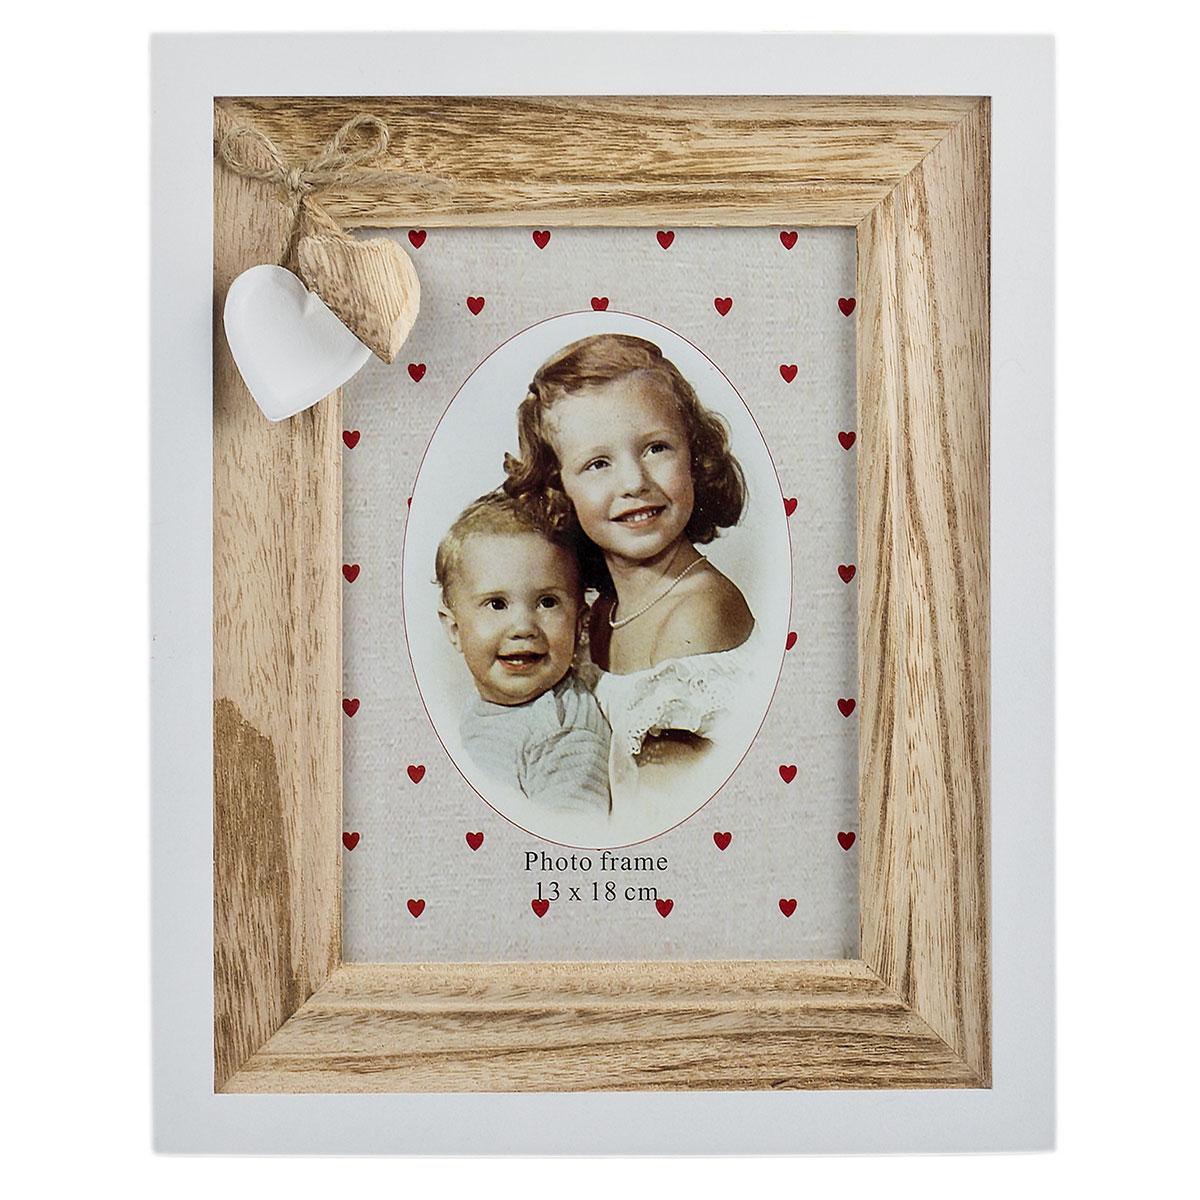 Bilderrahmen aus Holz, Herz, Fotorahmen, Portraitrahmen für 1 Foto ...